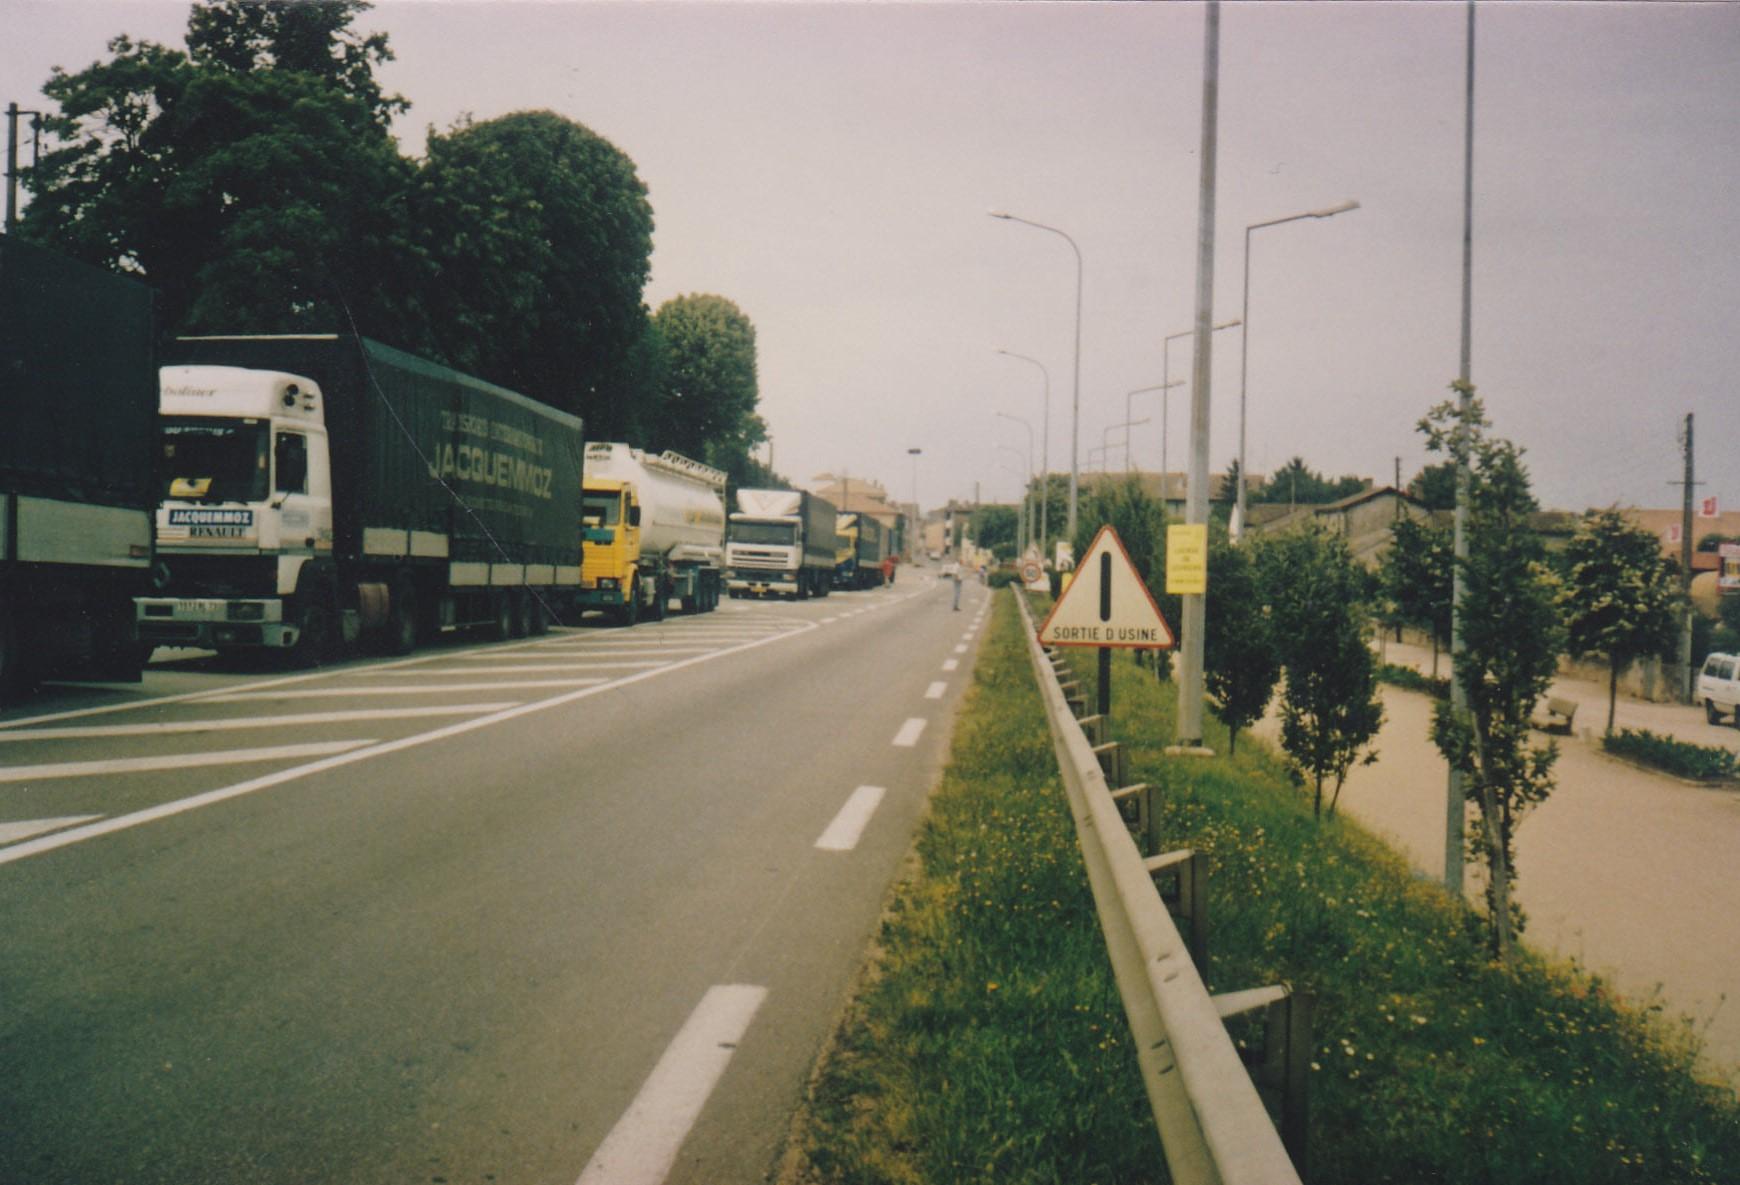 Veroni-Otto-Franken-Staking-Tournus-Frankrijk-1992-